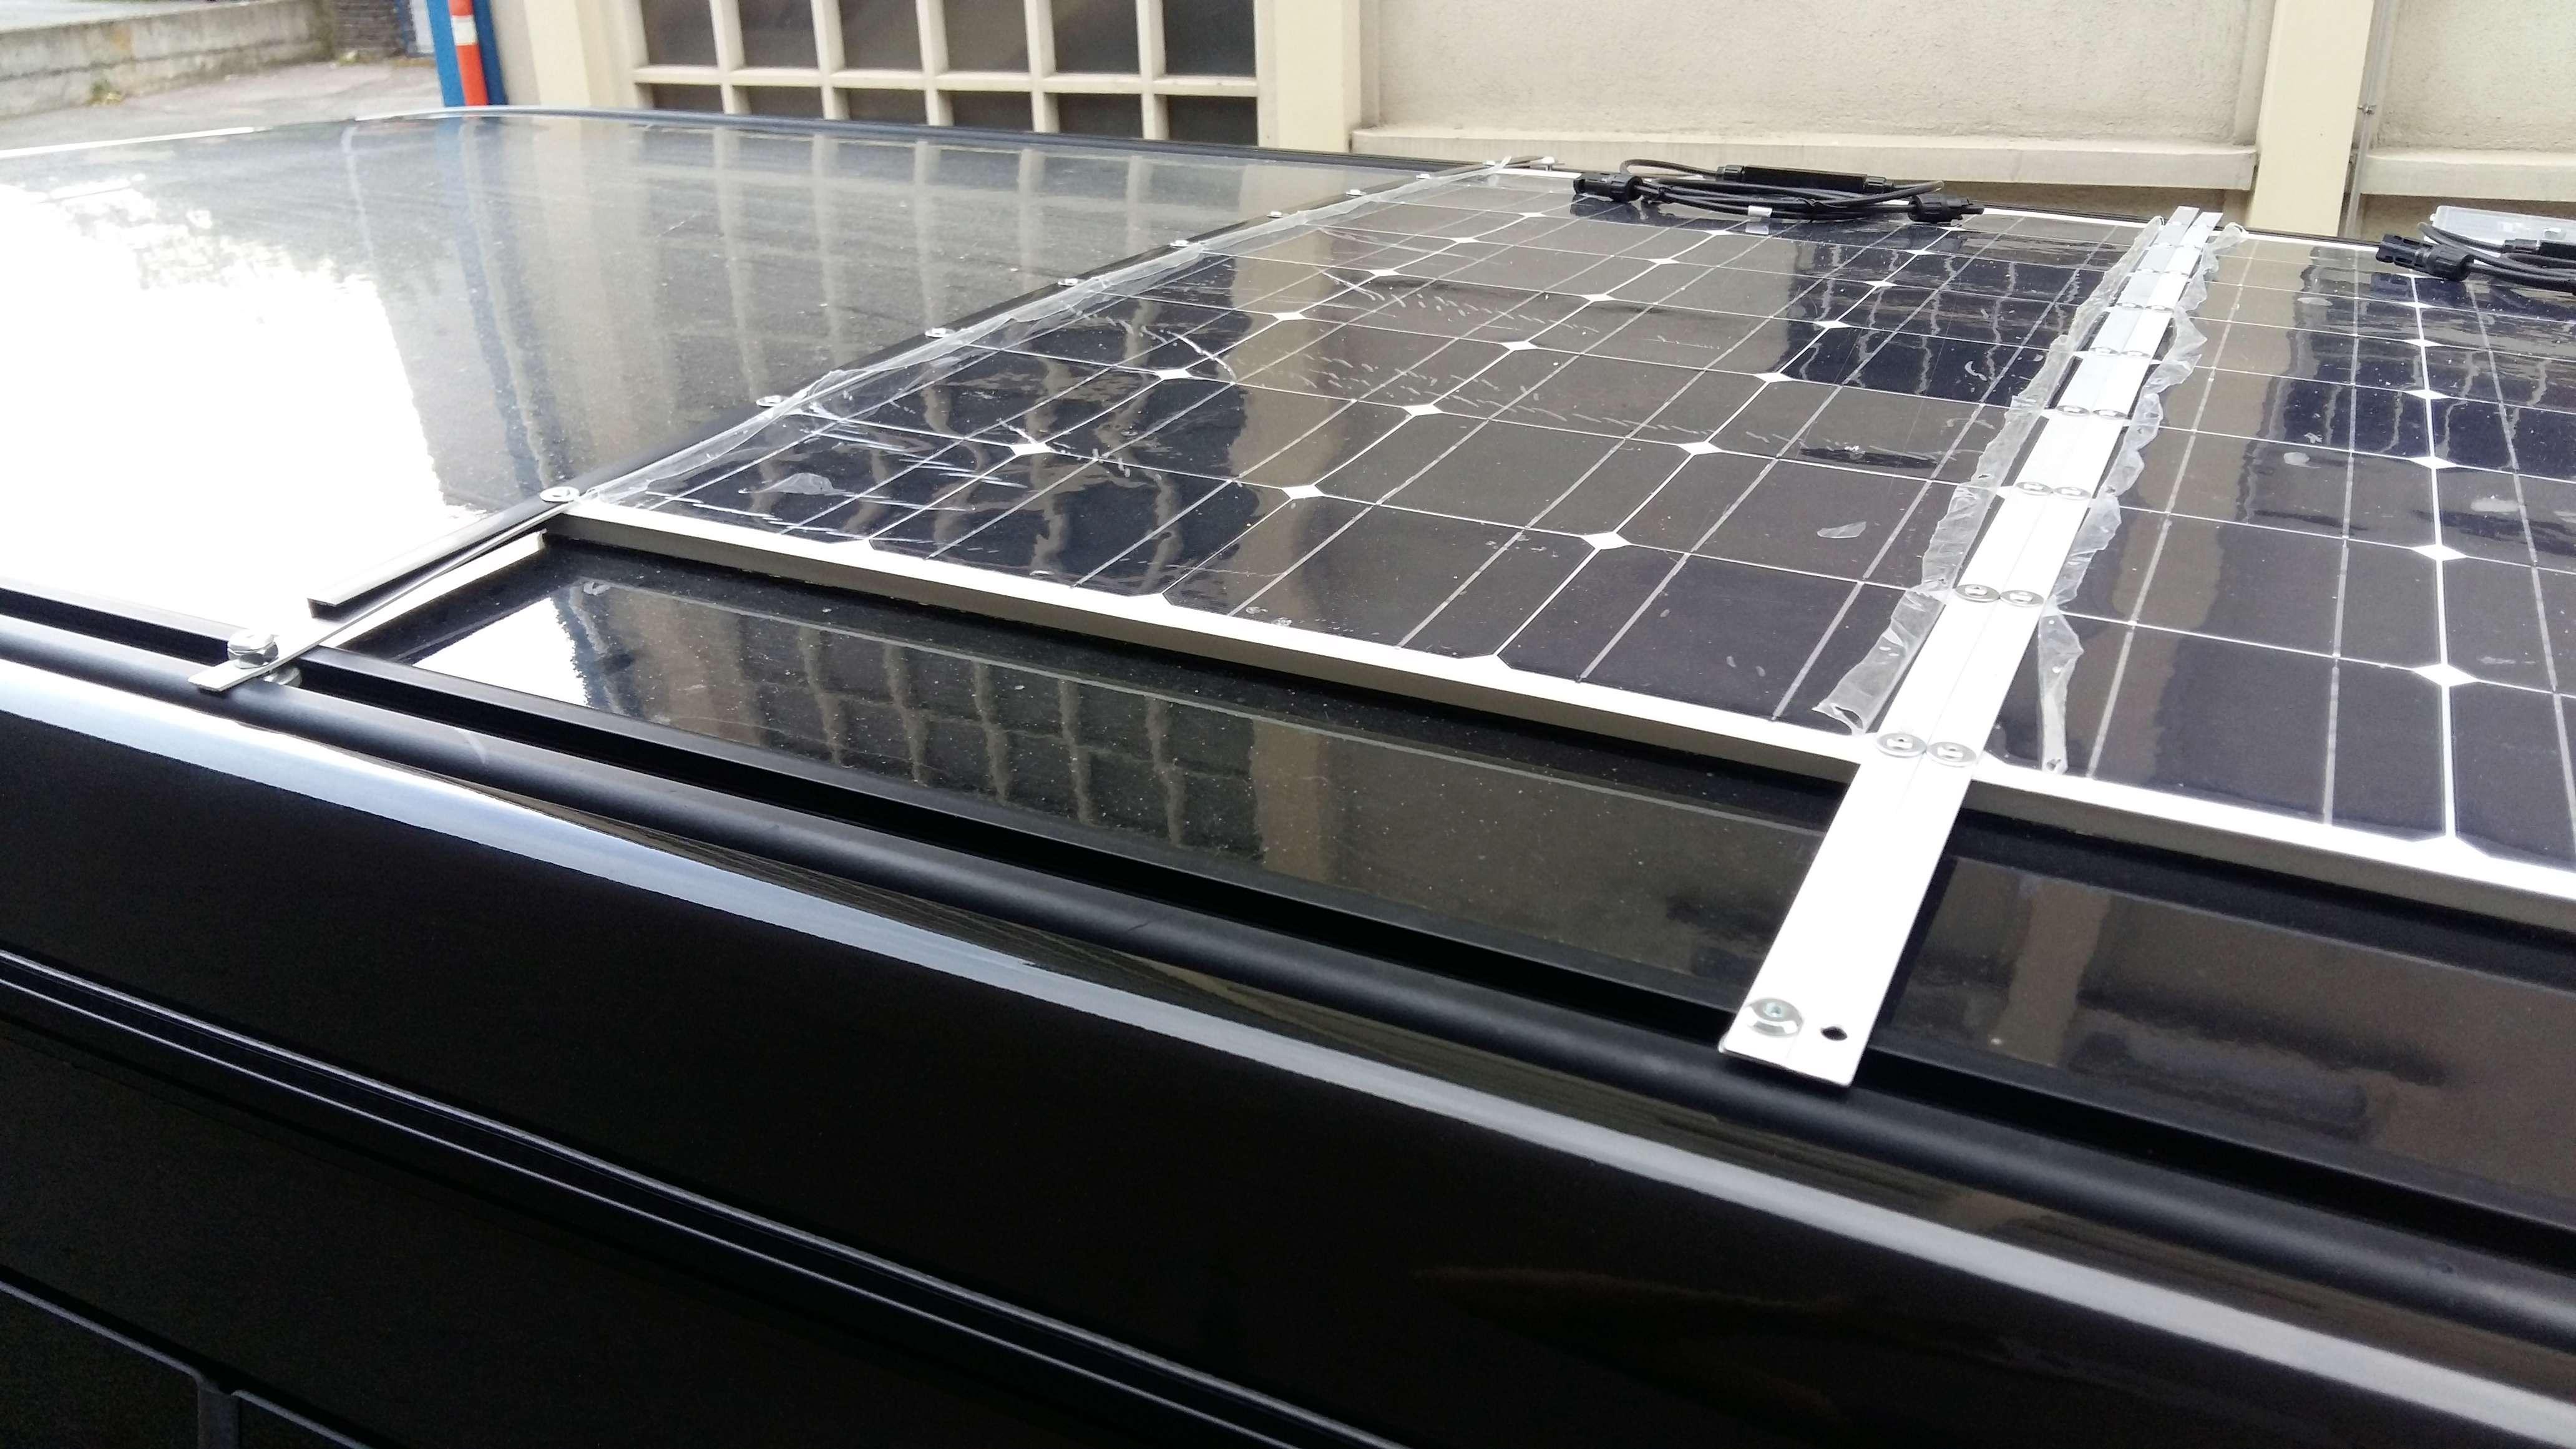 Panneaux solaires - c'est partiiiii 20180519